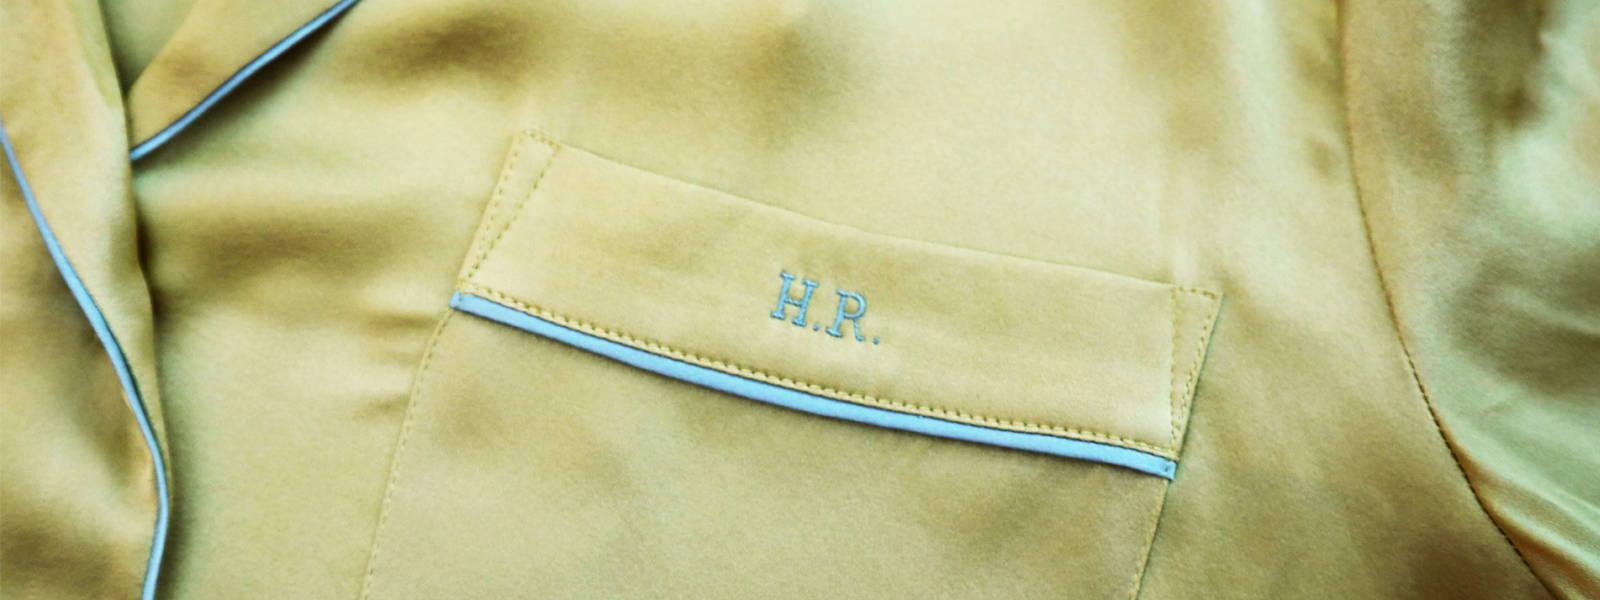 YOLKE Luxury Sleep & Daywear | Bespoke Monogramming | Starts at £15